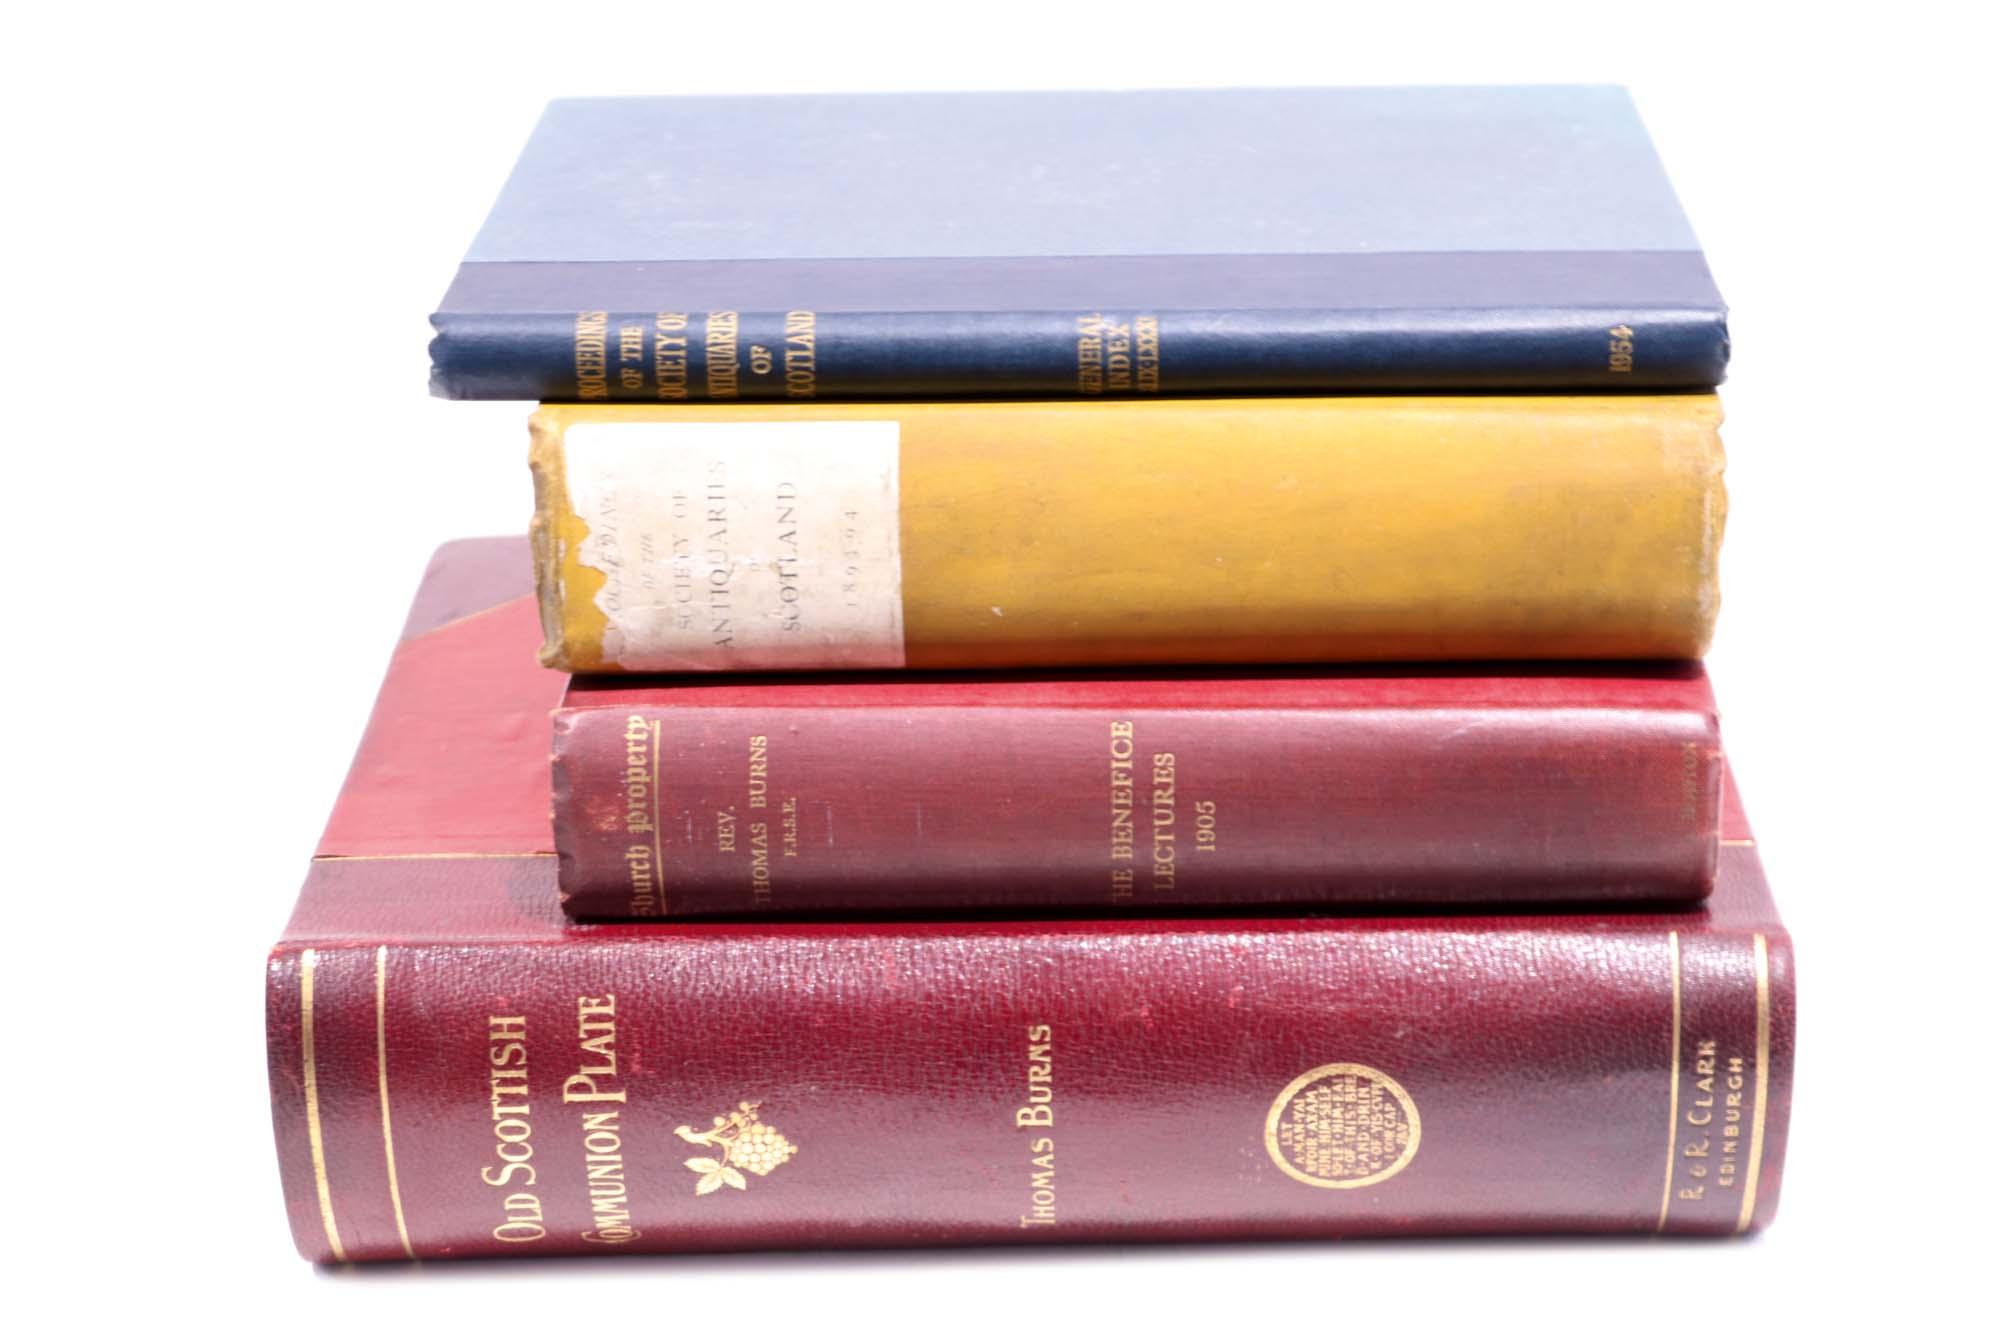 Lot 41 - Proceedings:- Bound Proceedings of the Society of Antiquairies of Scotland (1893-94, 1933-34, 1934-